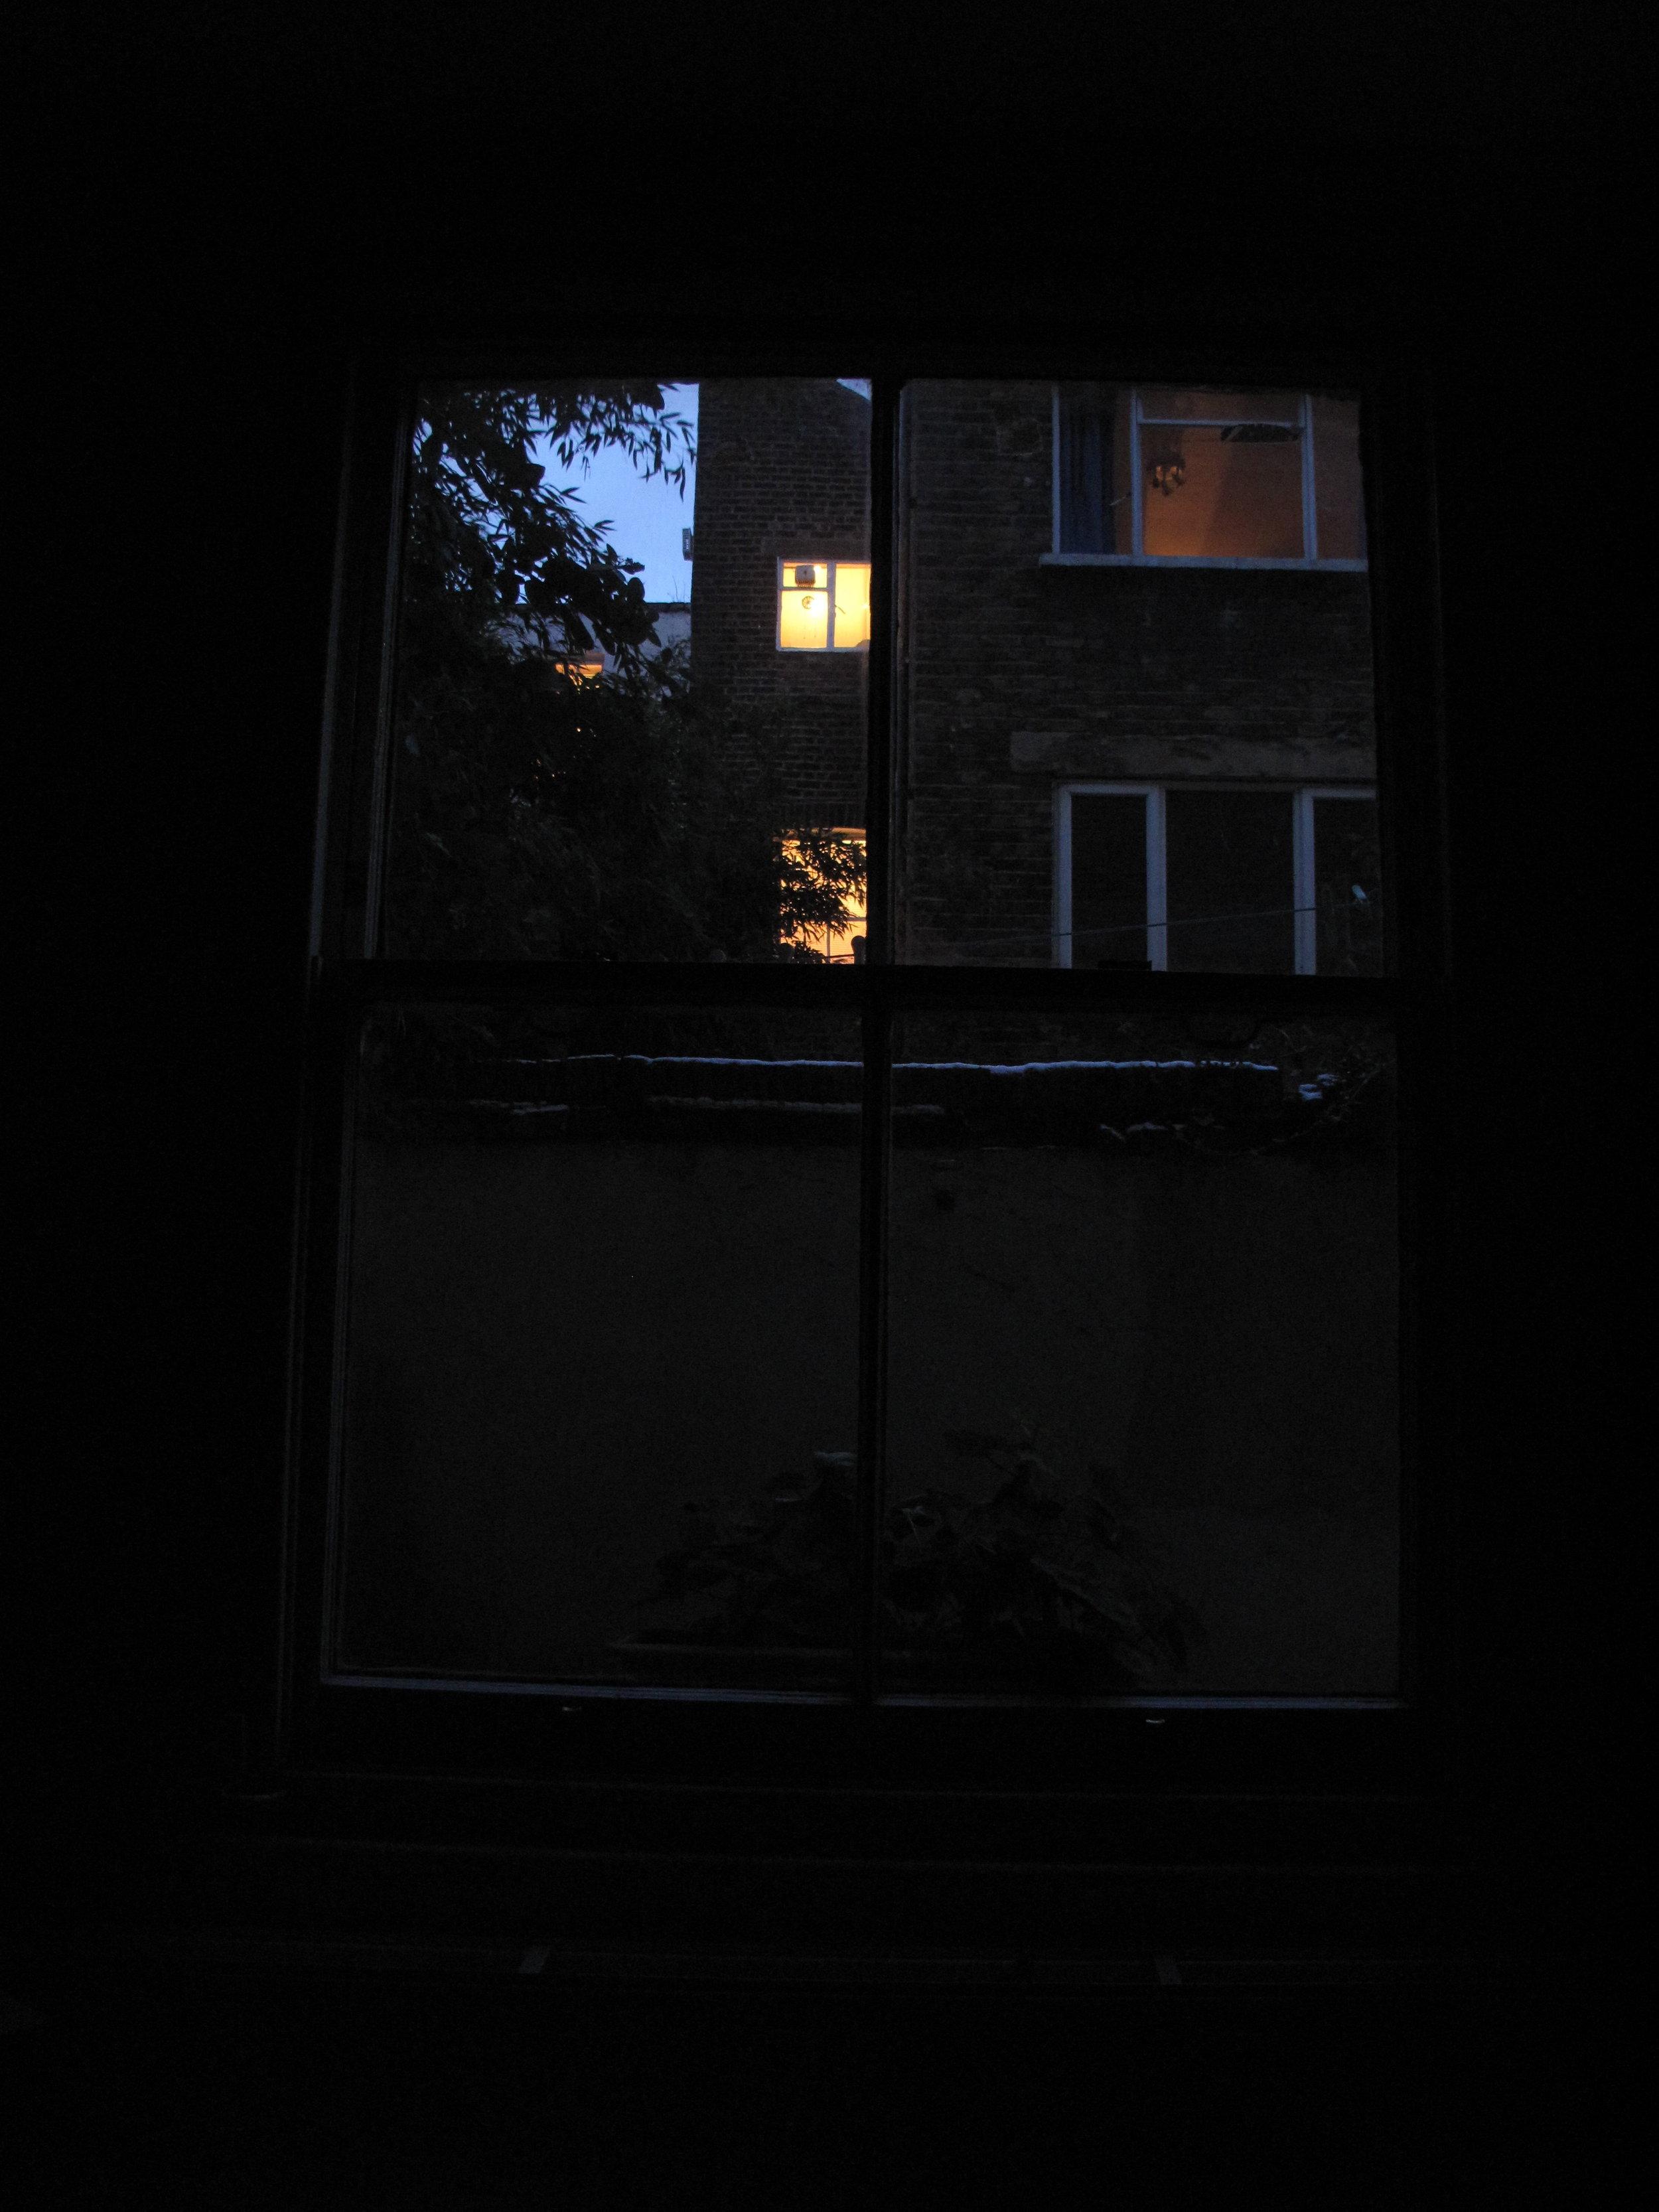 f.Lounge window 7 Jan, 4.40pm.JPG